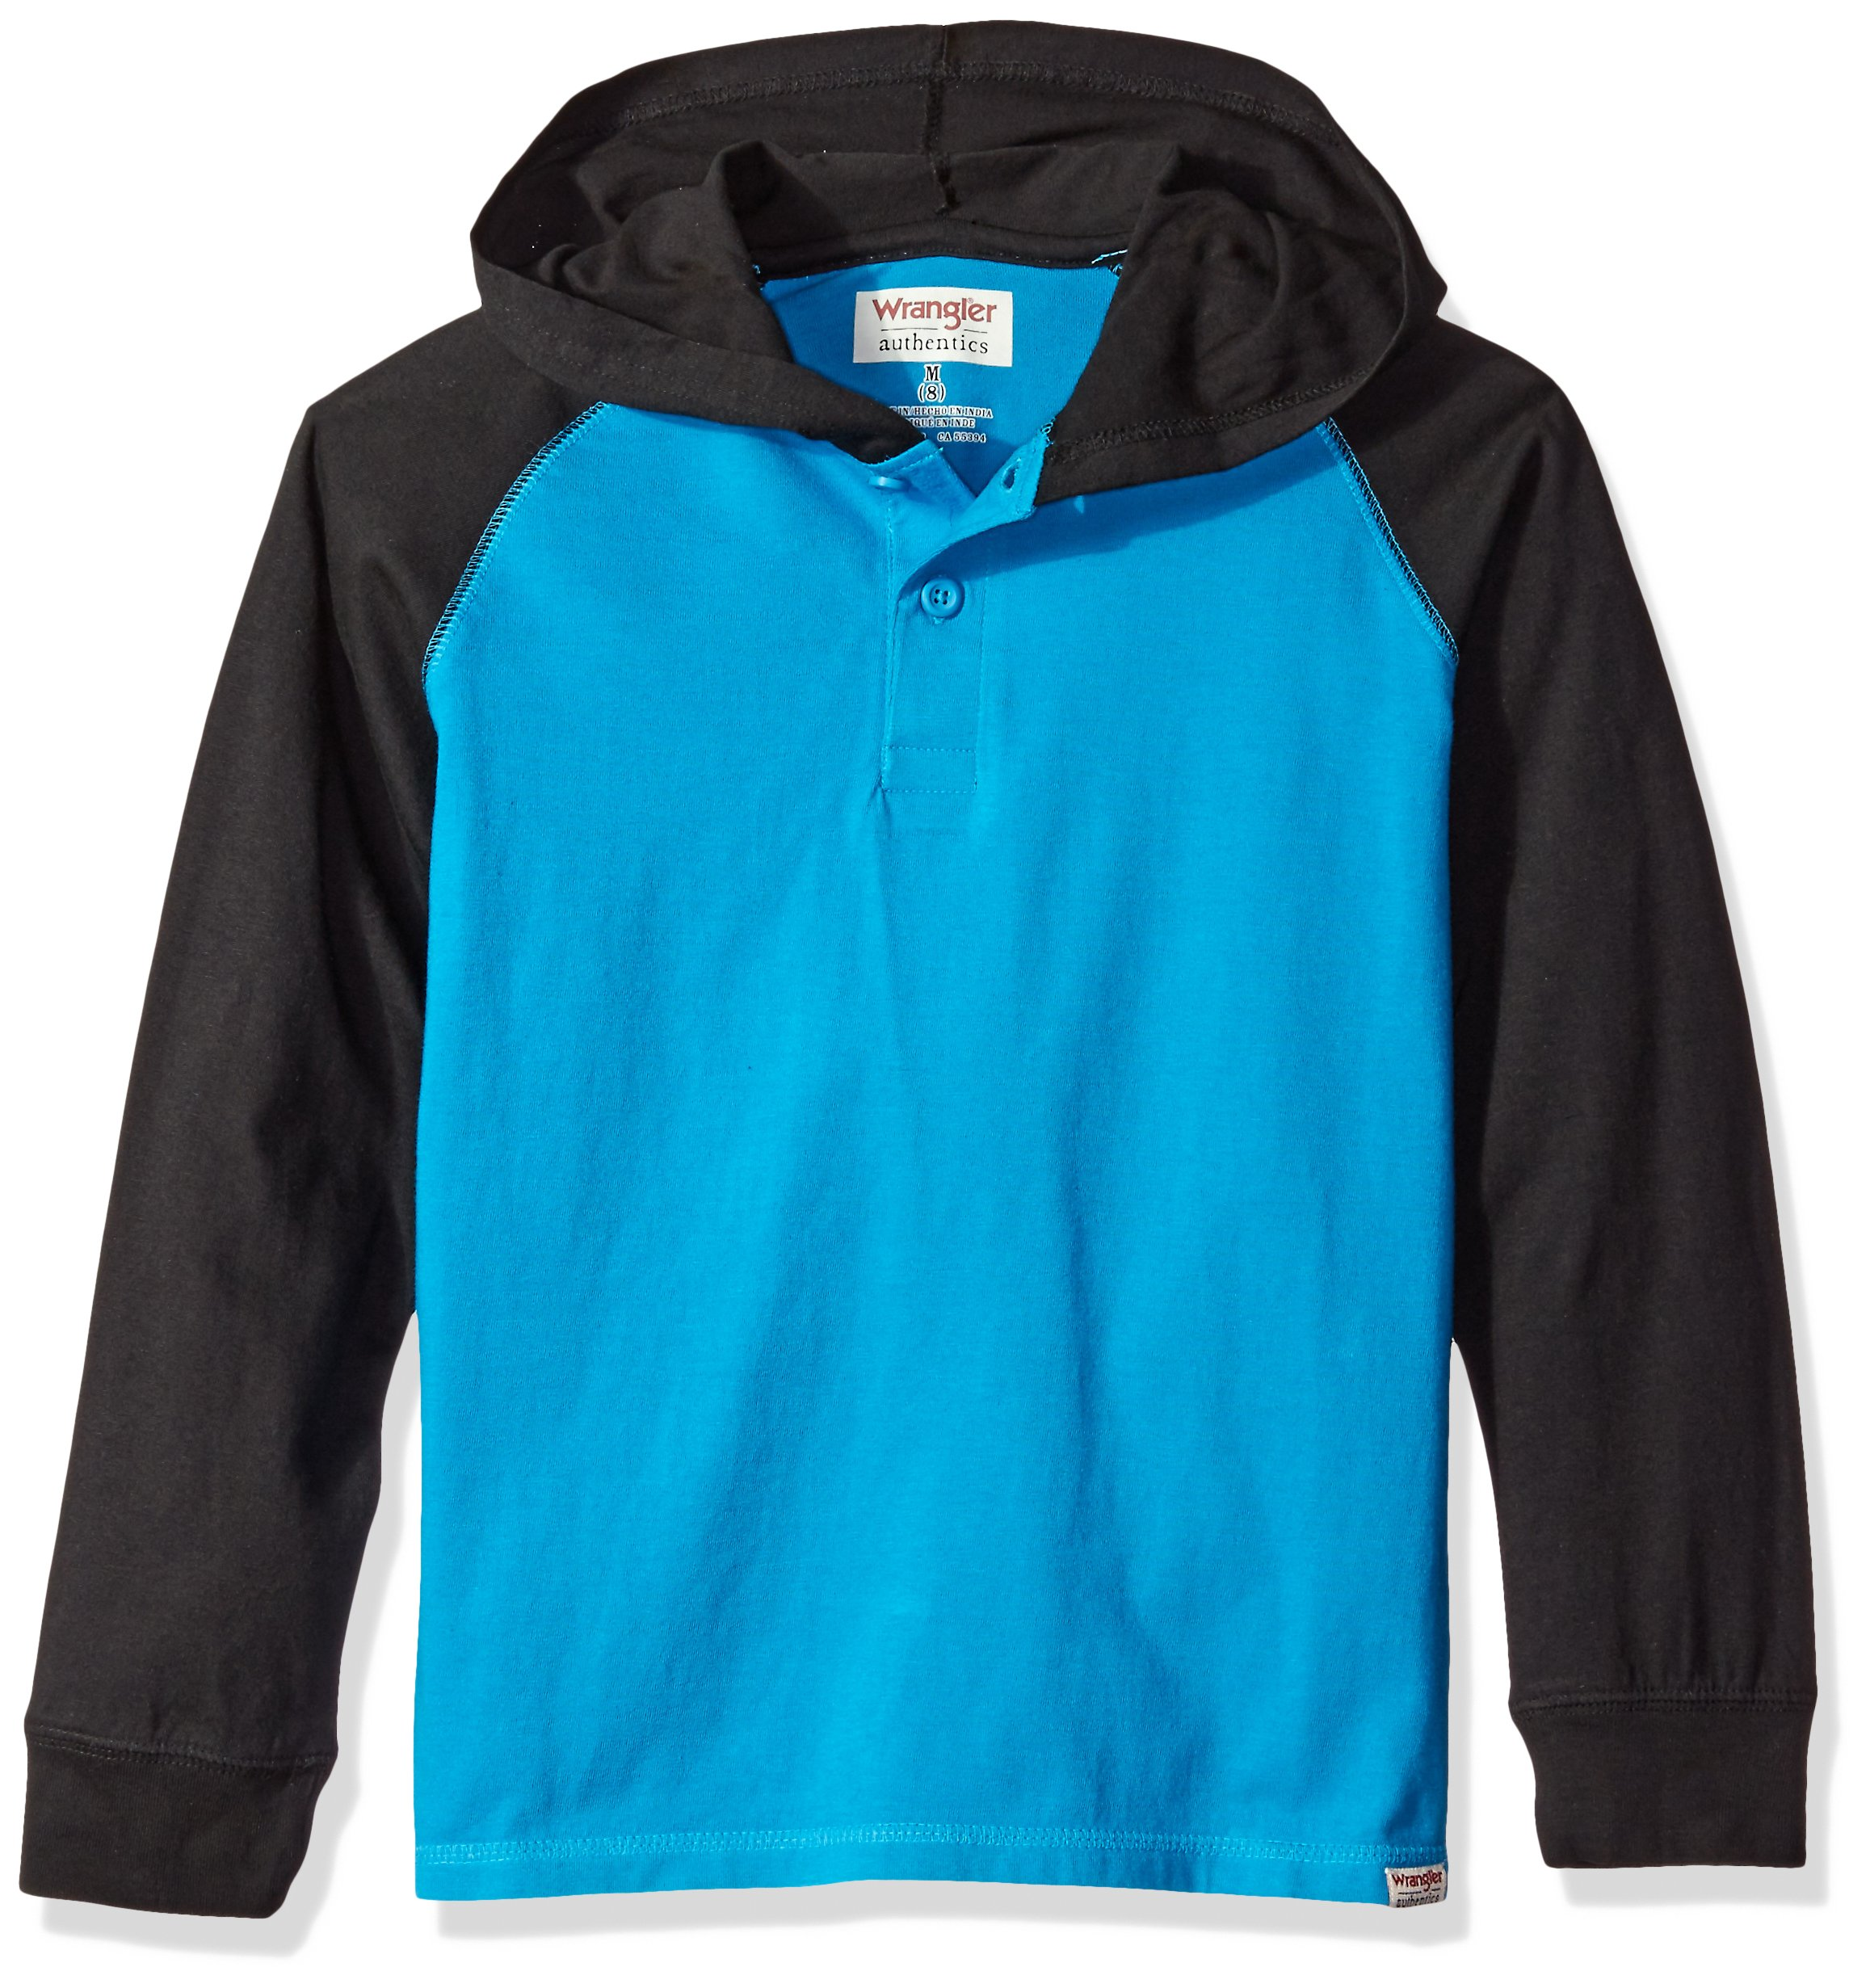 Wrangler Little Boys' Authentics Long Sleeve Hoodie, Turquoise/Black, Small